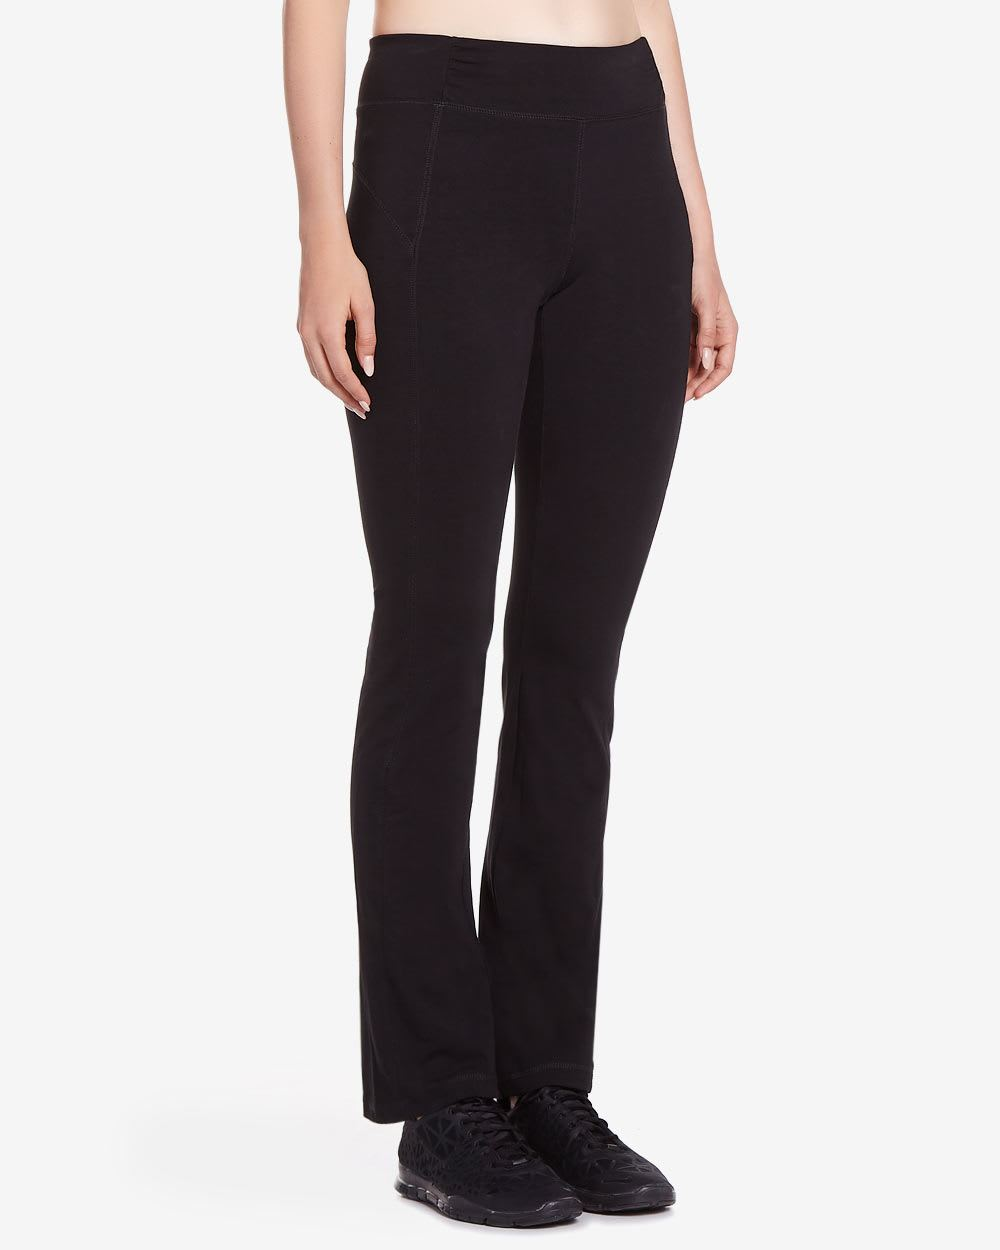 edfac2f69d554 Hyba Ultra Petite Yoga Pant | Ultra Petites | Reitmans